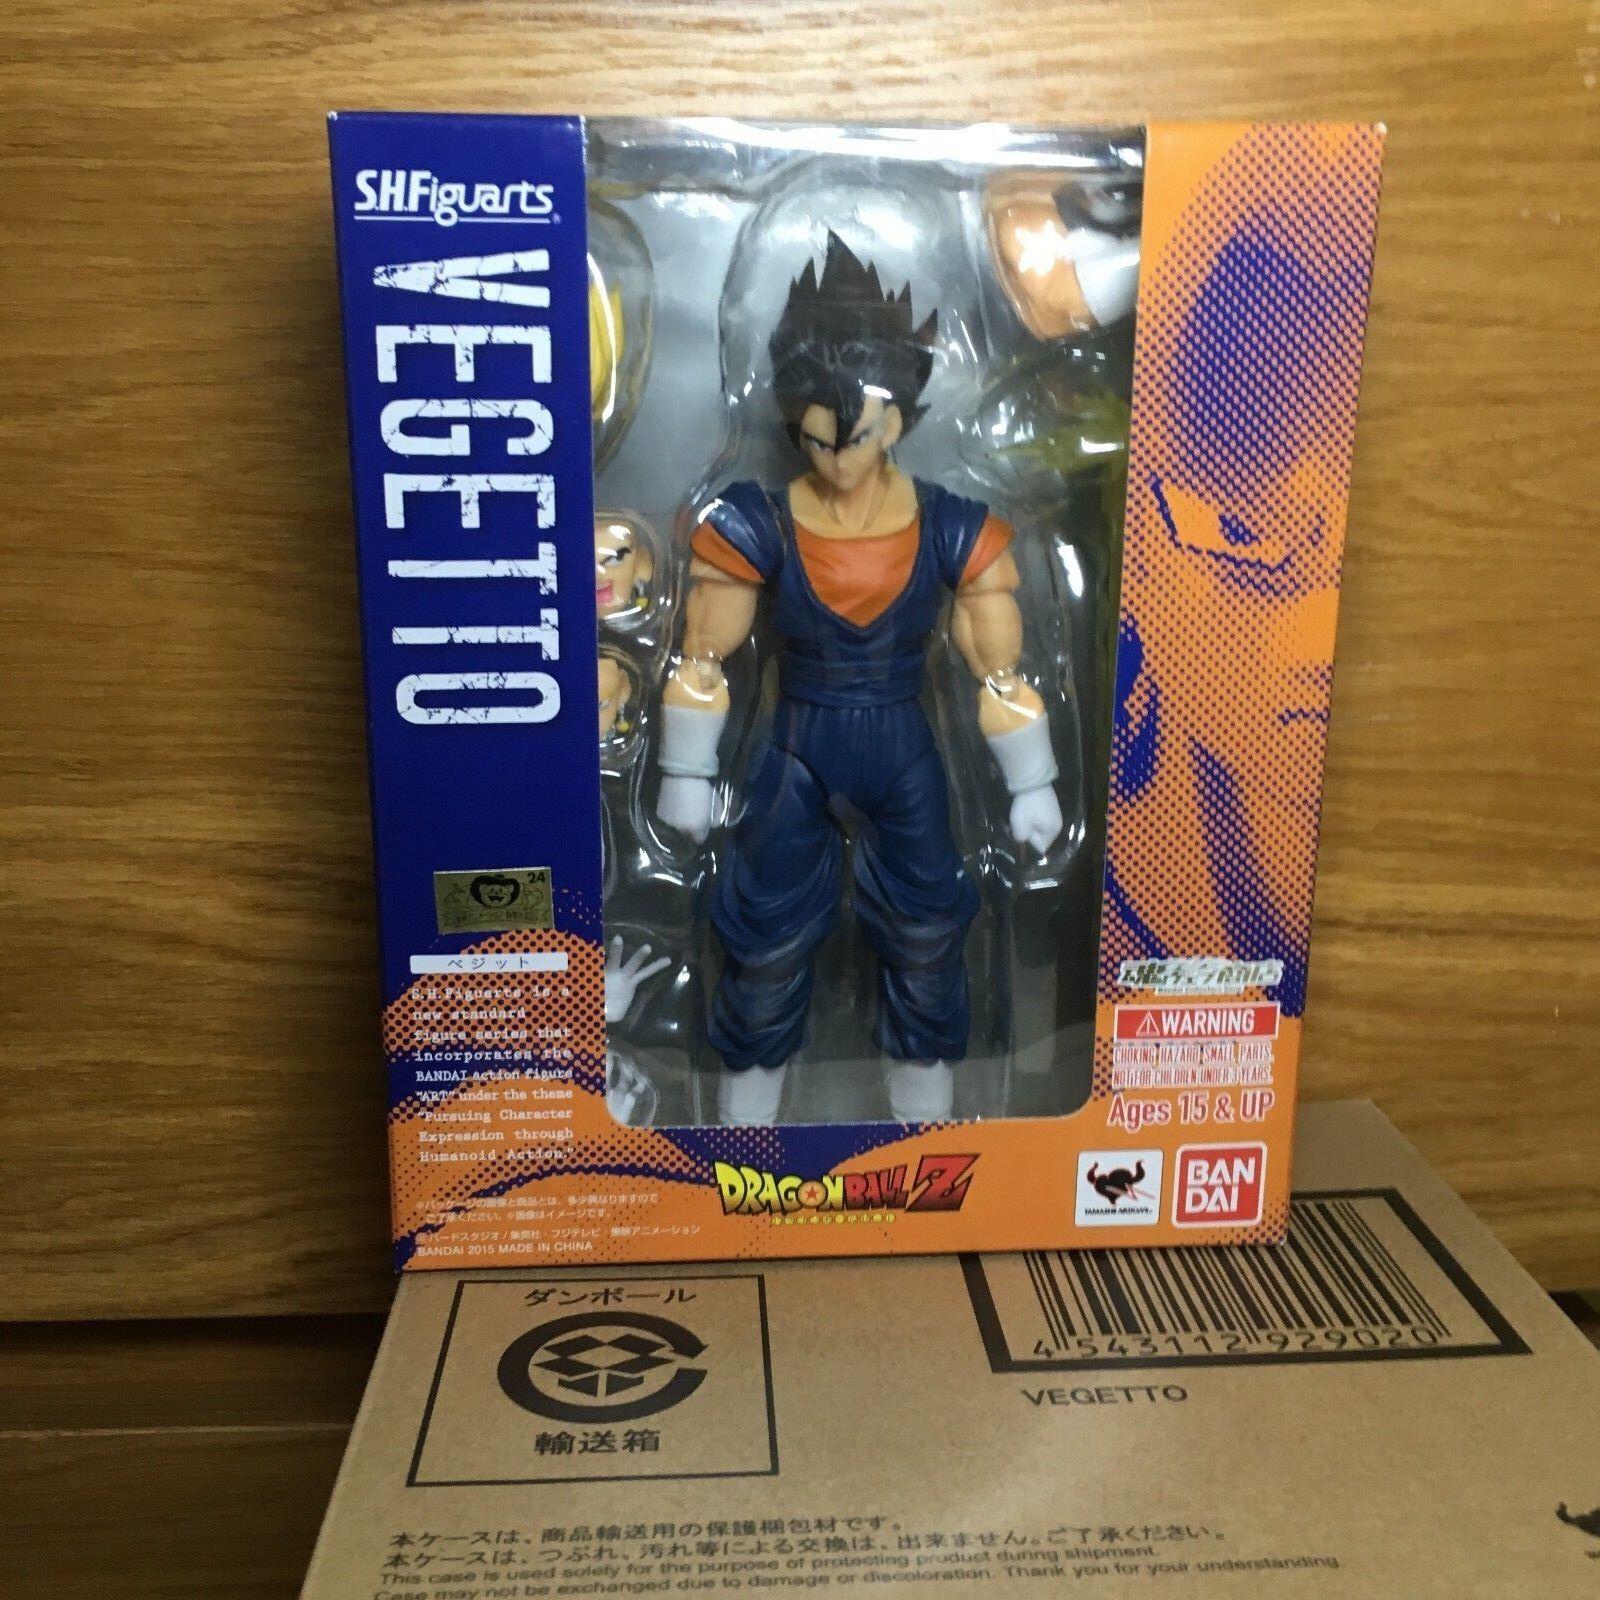 DragonBall Z Bandai SH Figuarts Figuarts Figuarts Vegetto Action Figure Model 55a7a7